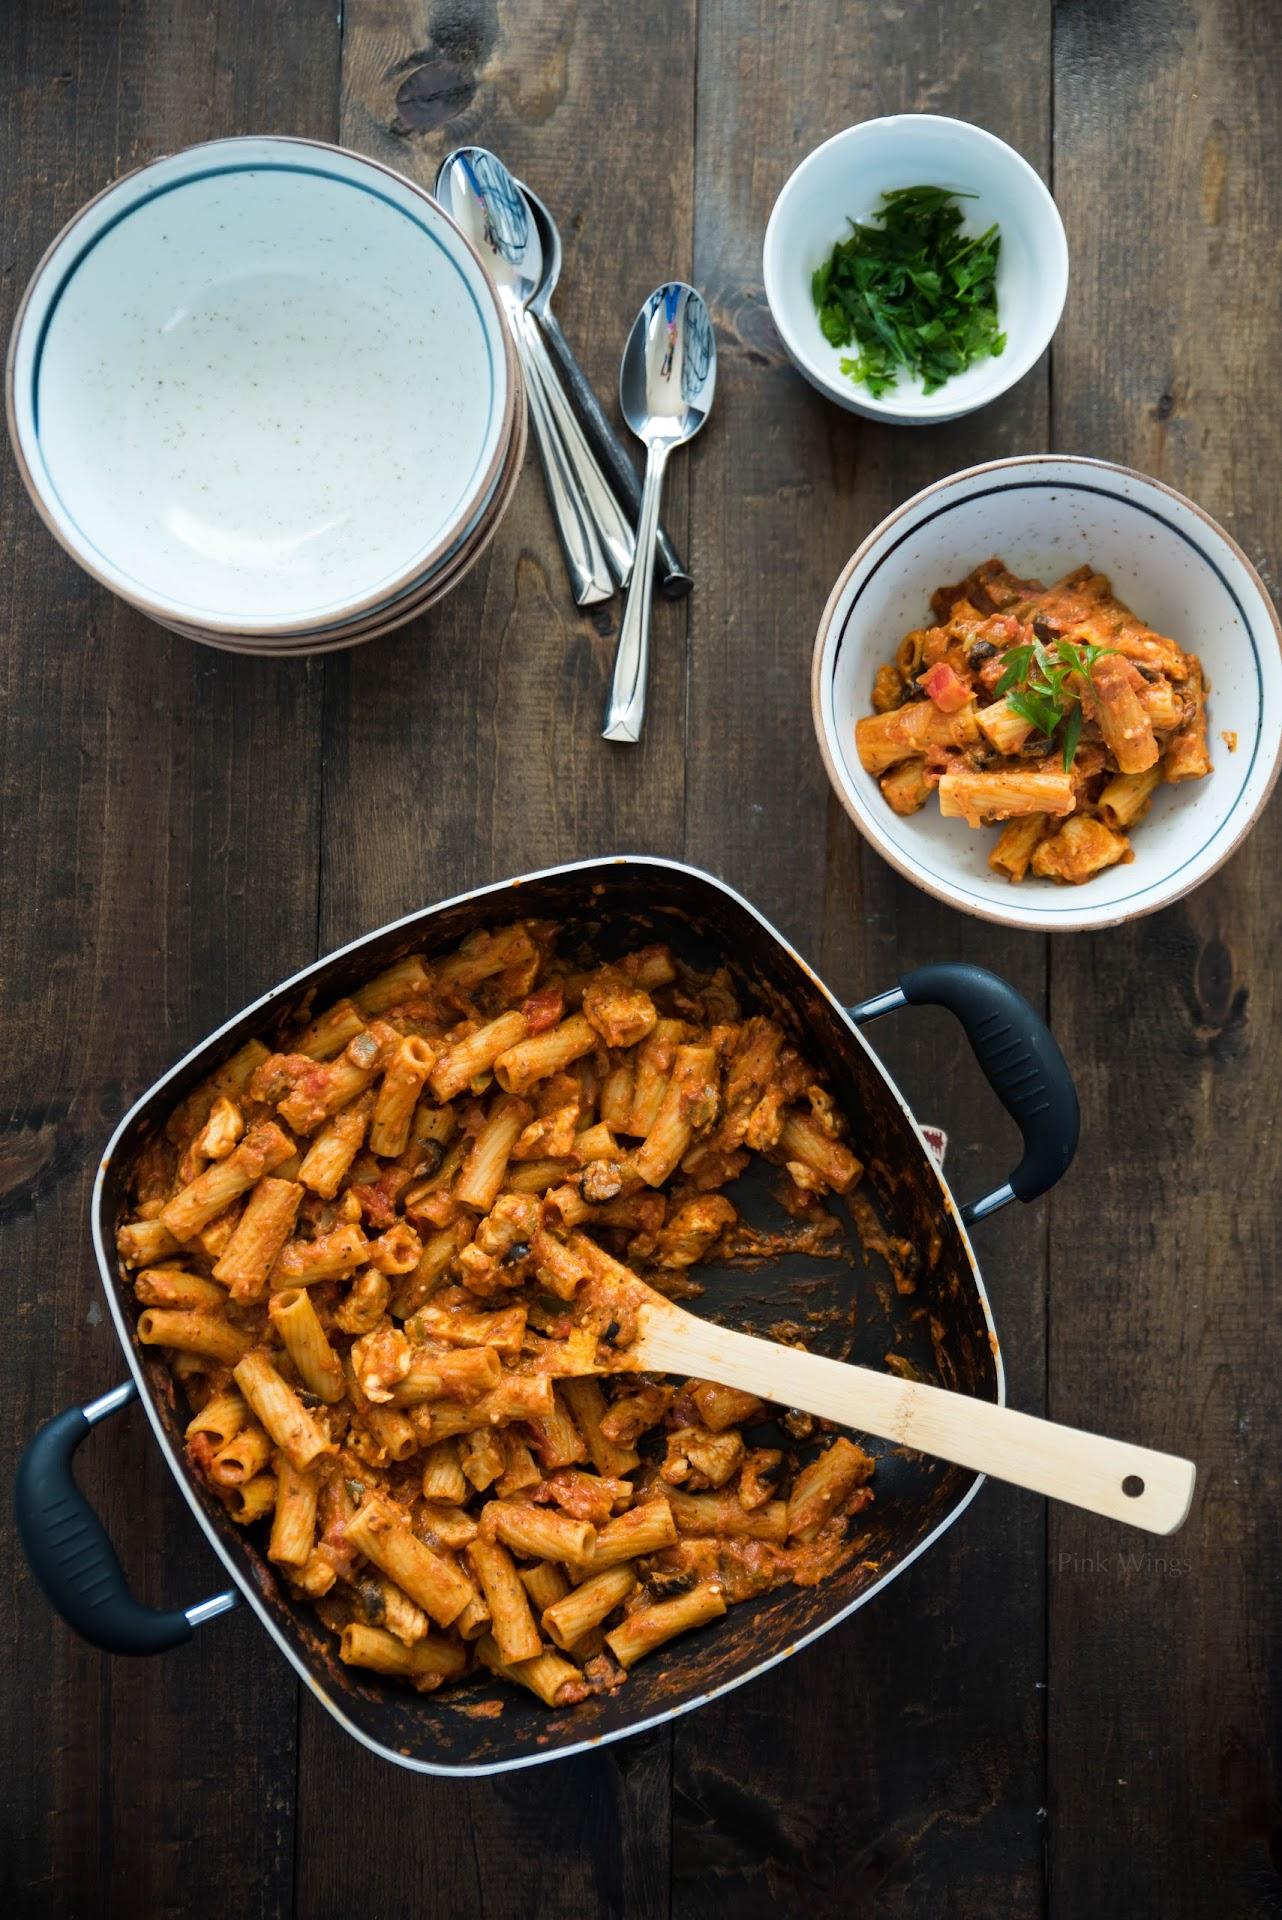 rigatoni pasta recipe, chicken riggies recipe, utica ny food, upstate ny blogger, lds mormon food blogger, one pot pasta dish recipe, creamy pasta sauce, spicy pasta, san francisco bay area food blogger, california, asian blogger, easy italian recipe